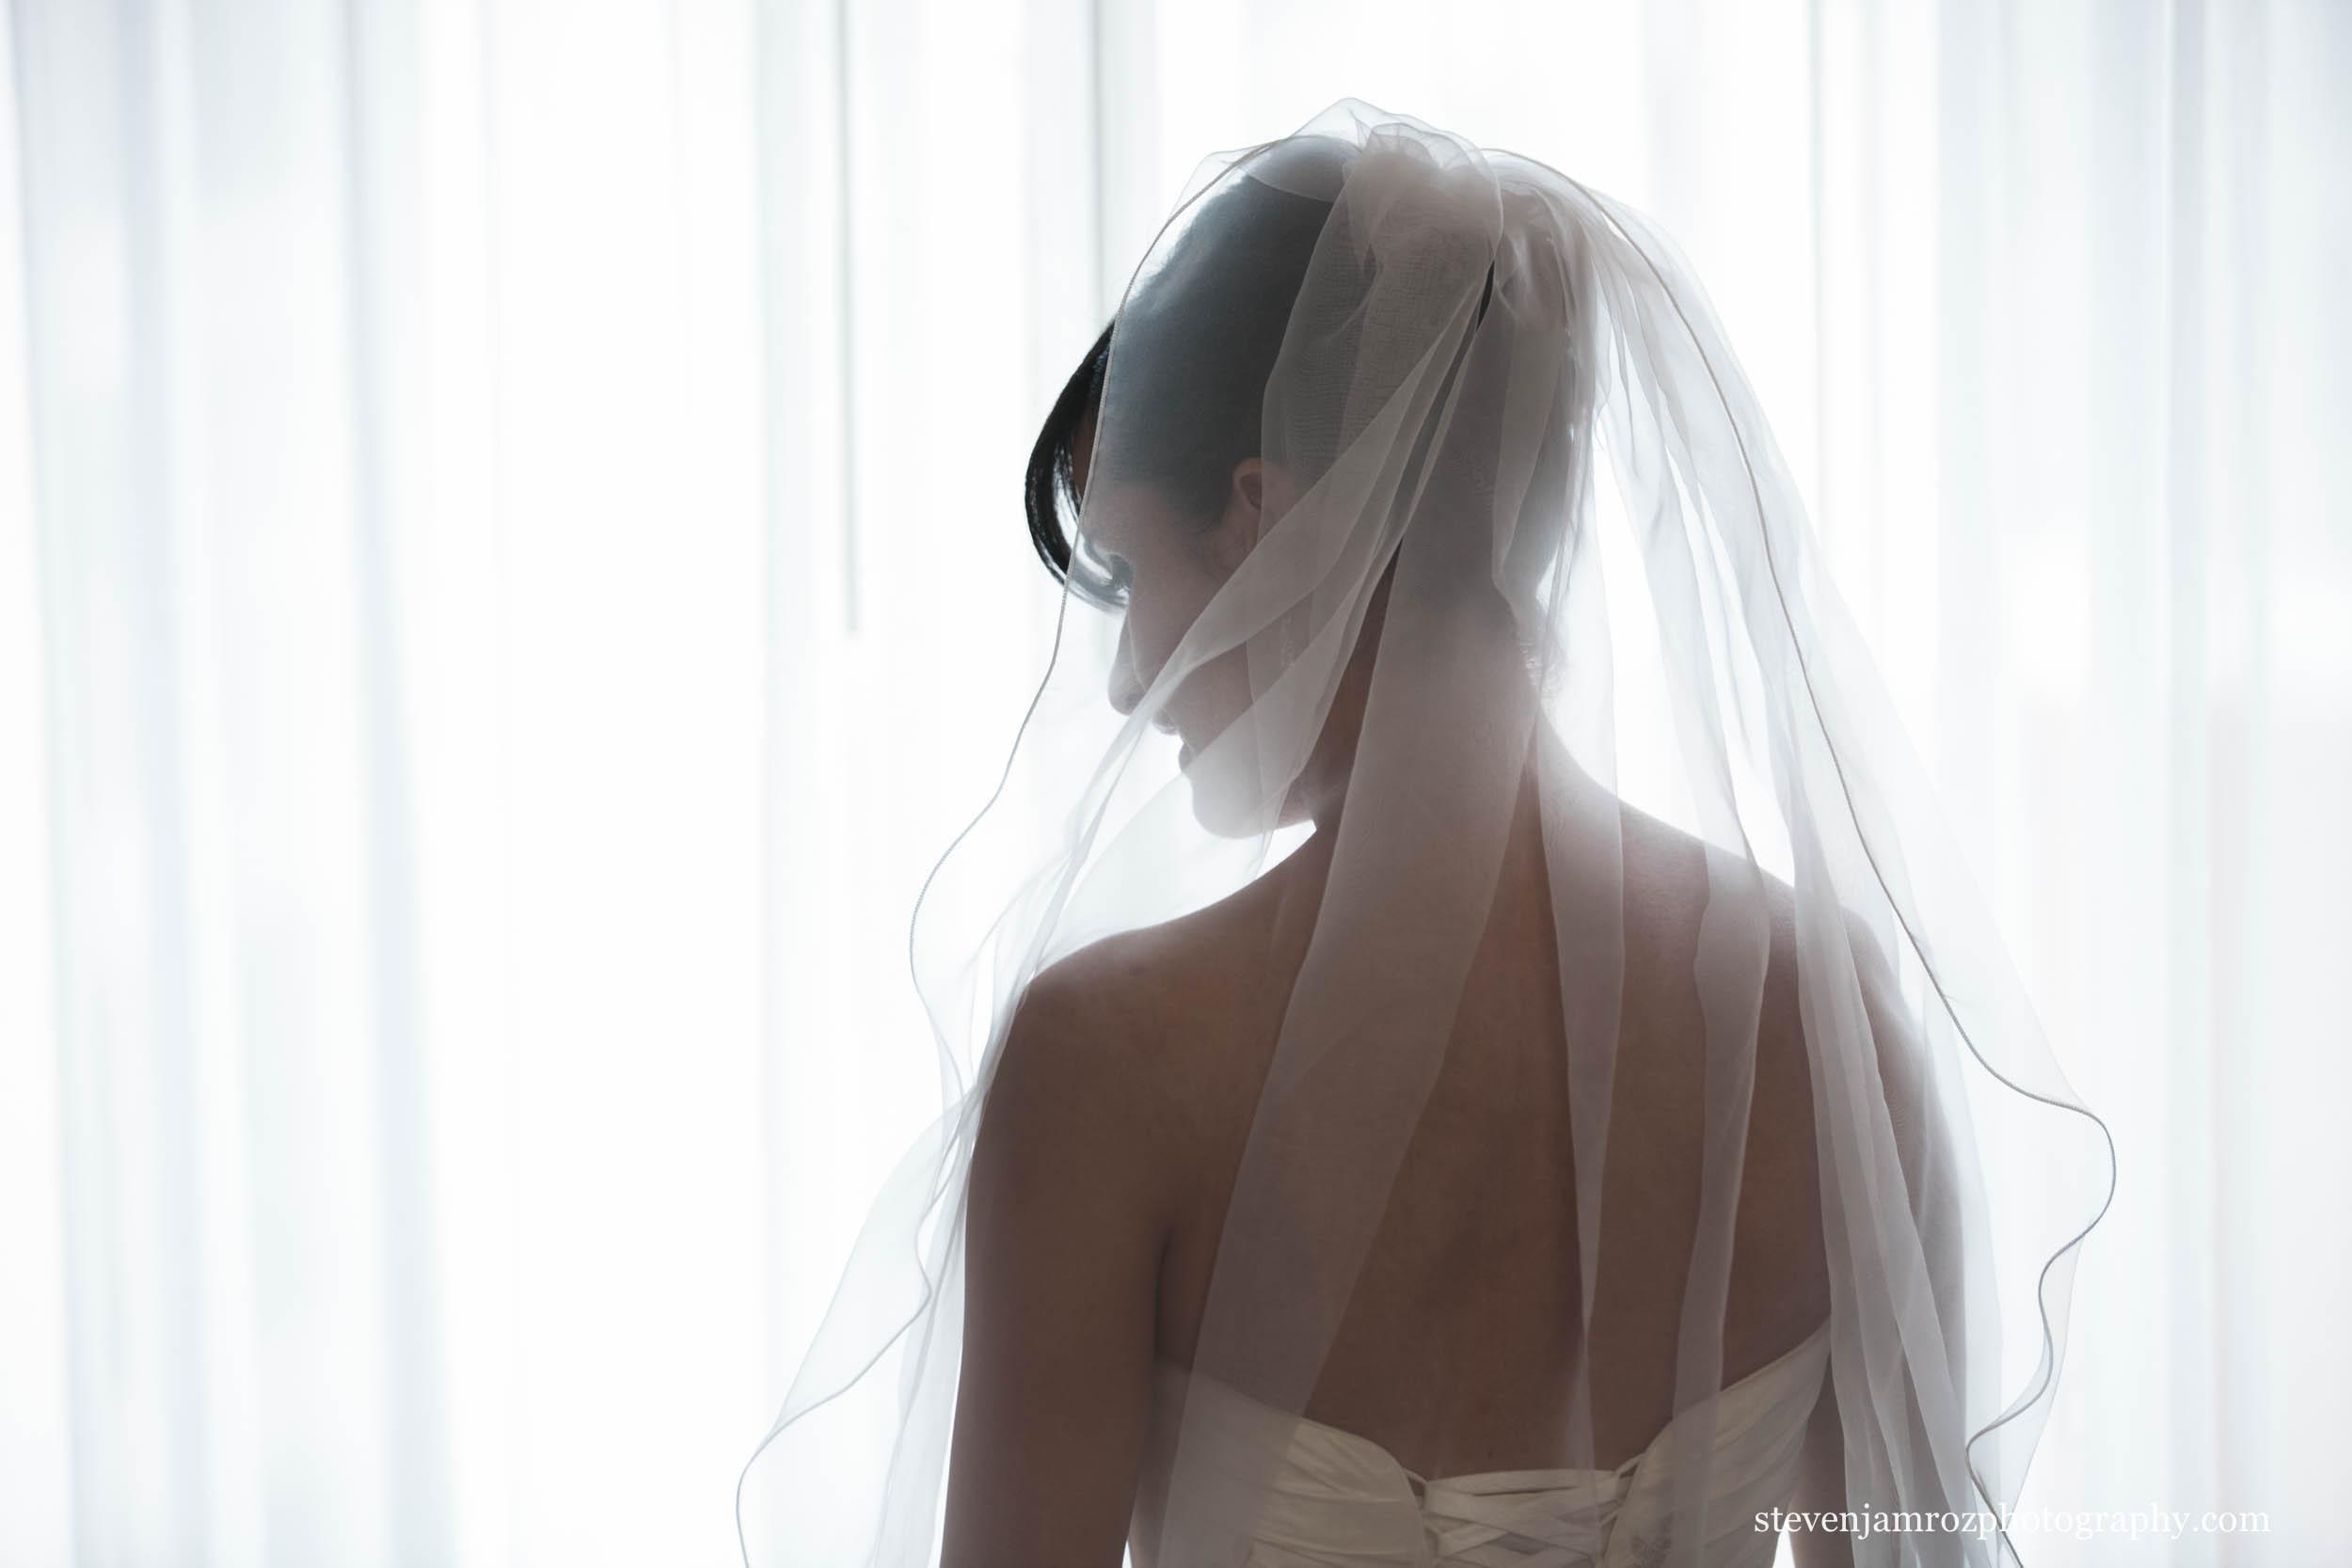 backlit-window-portrait-bride-wedding-photography-0961.jpg